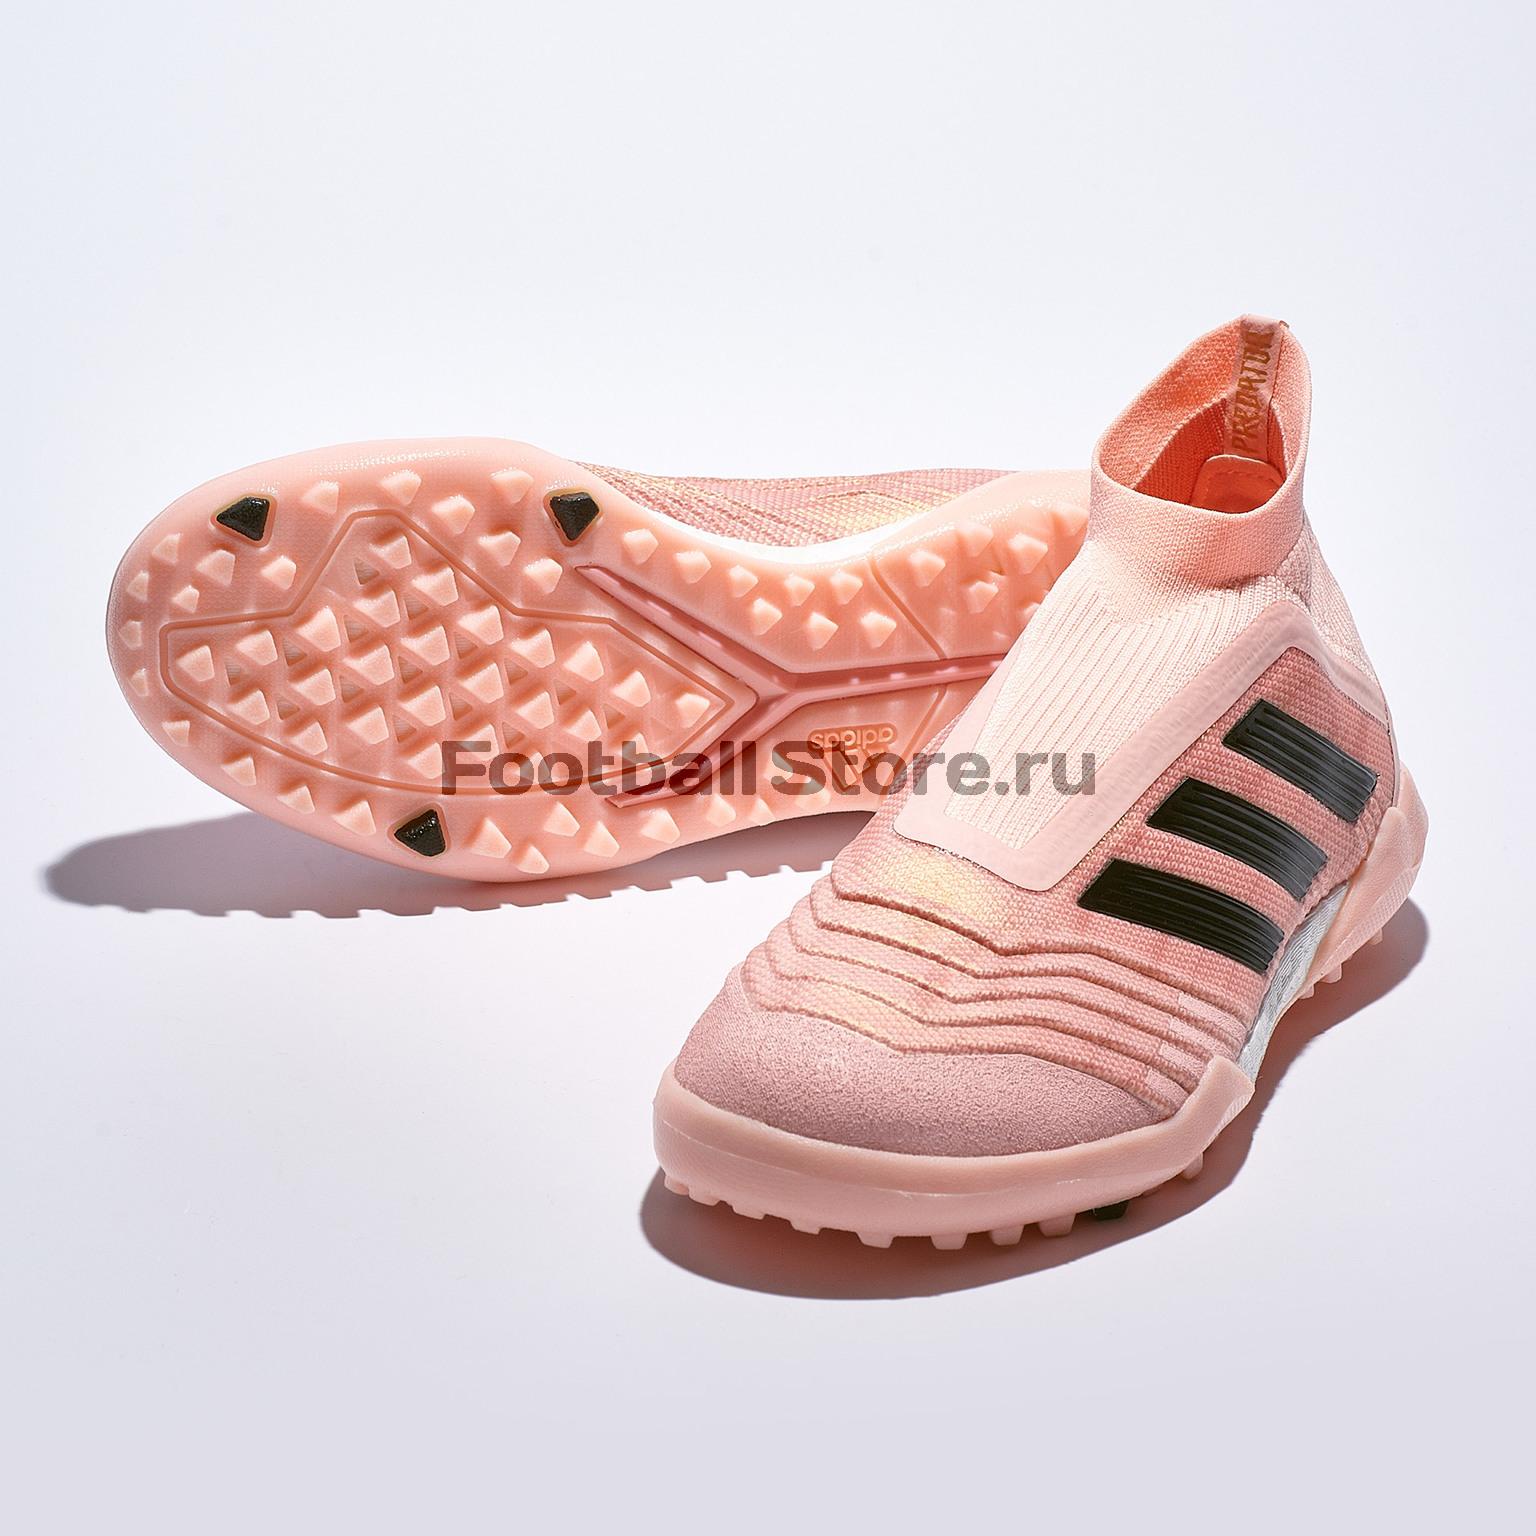 Шиповки Adidas Predator Tango 18+ TF DB2059 бутсы adidas predator 18 fg db2010